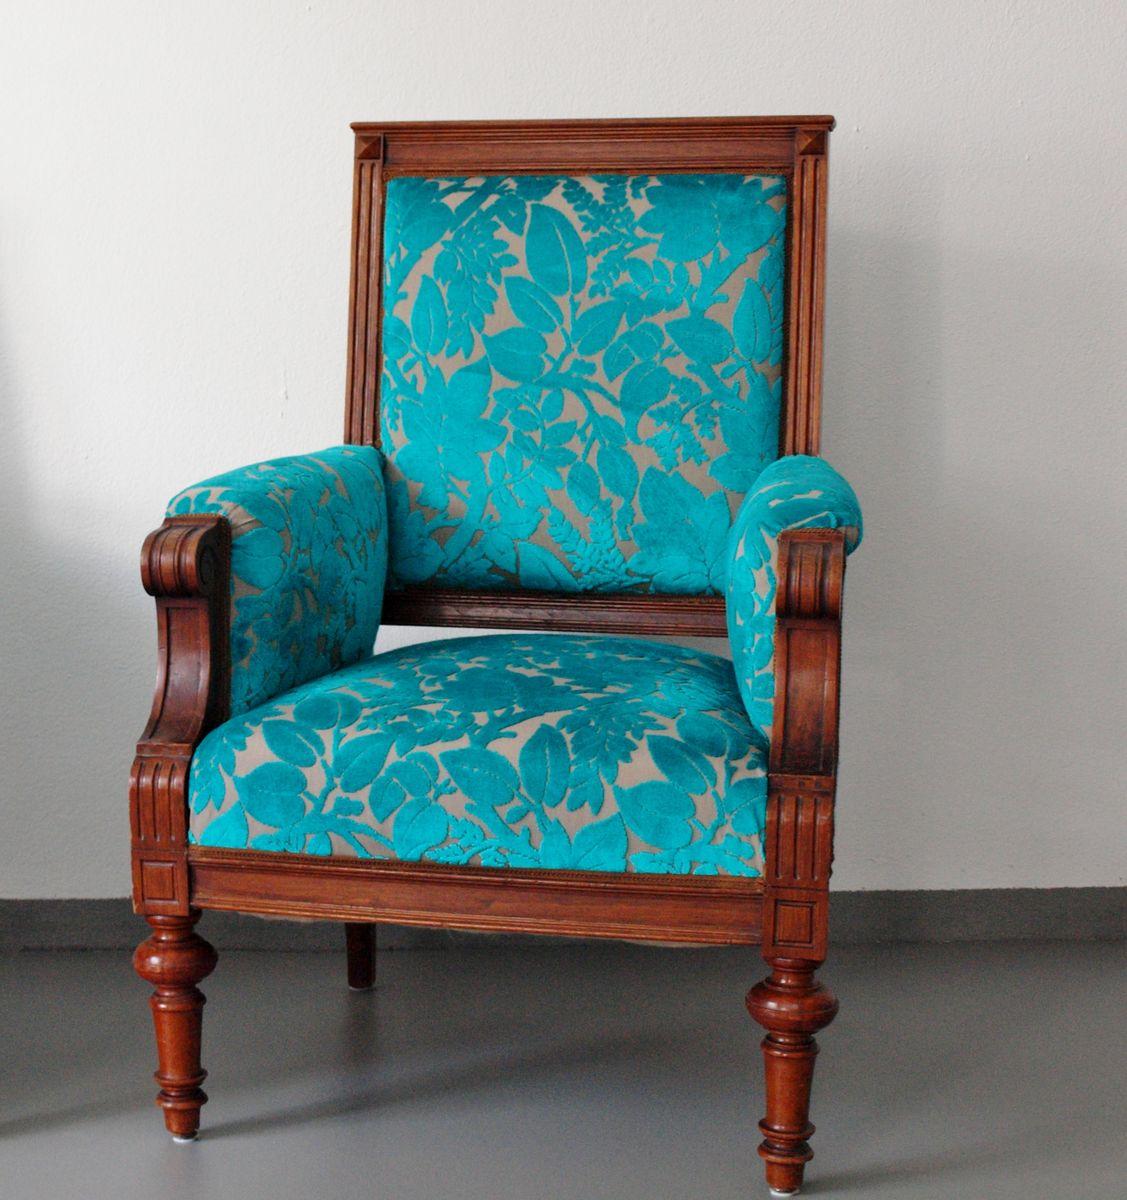 Antiker Sessel aus der Gründerzeit, 1890er